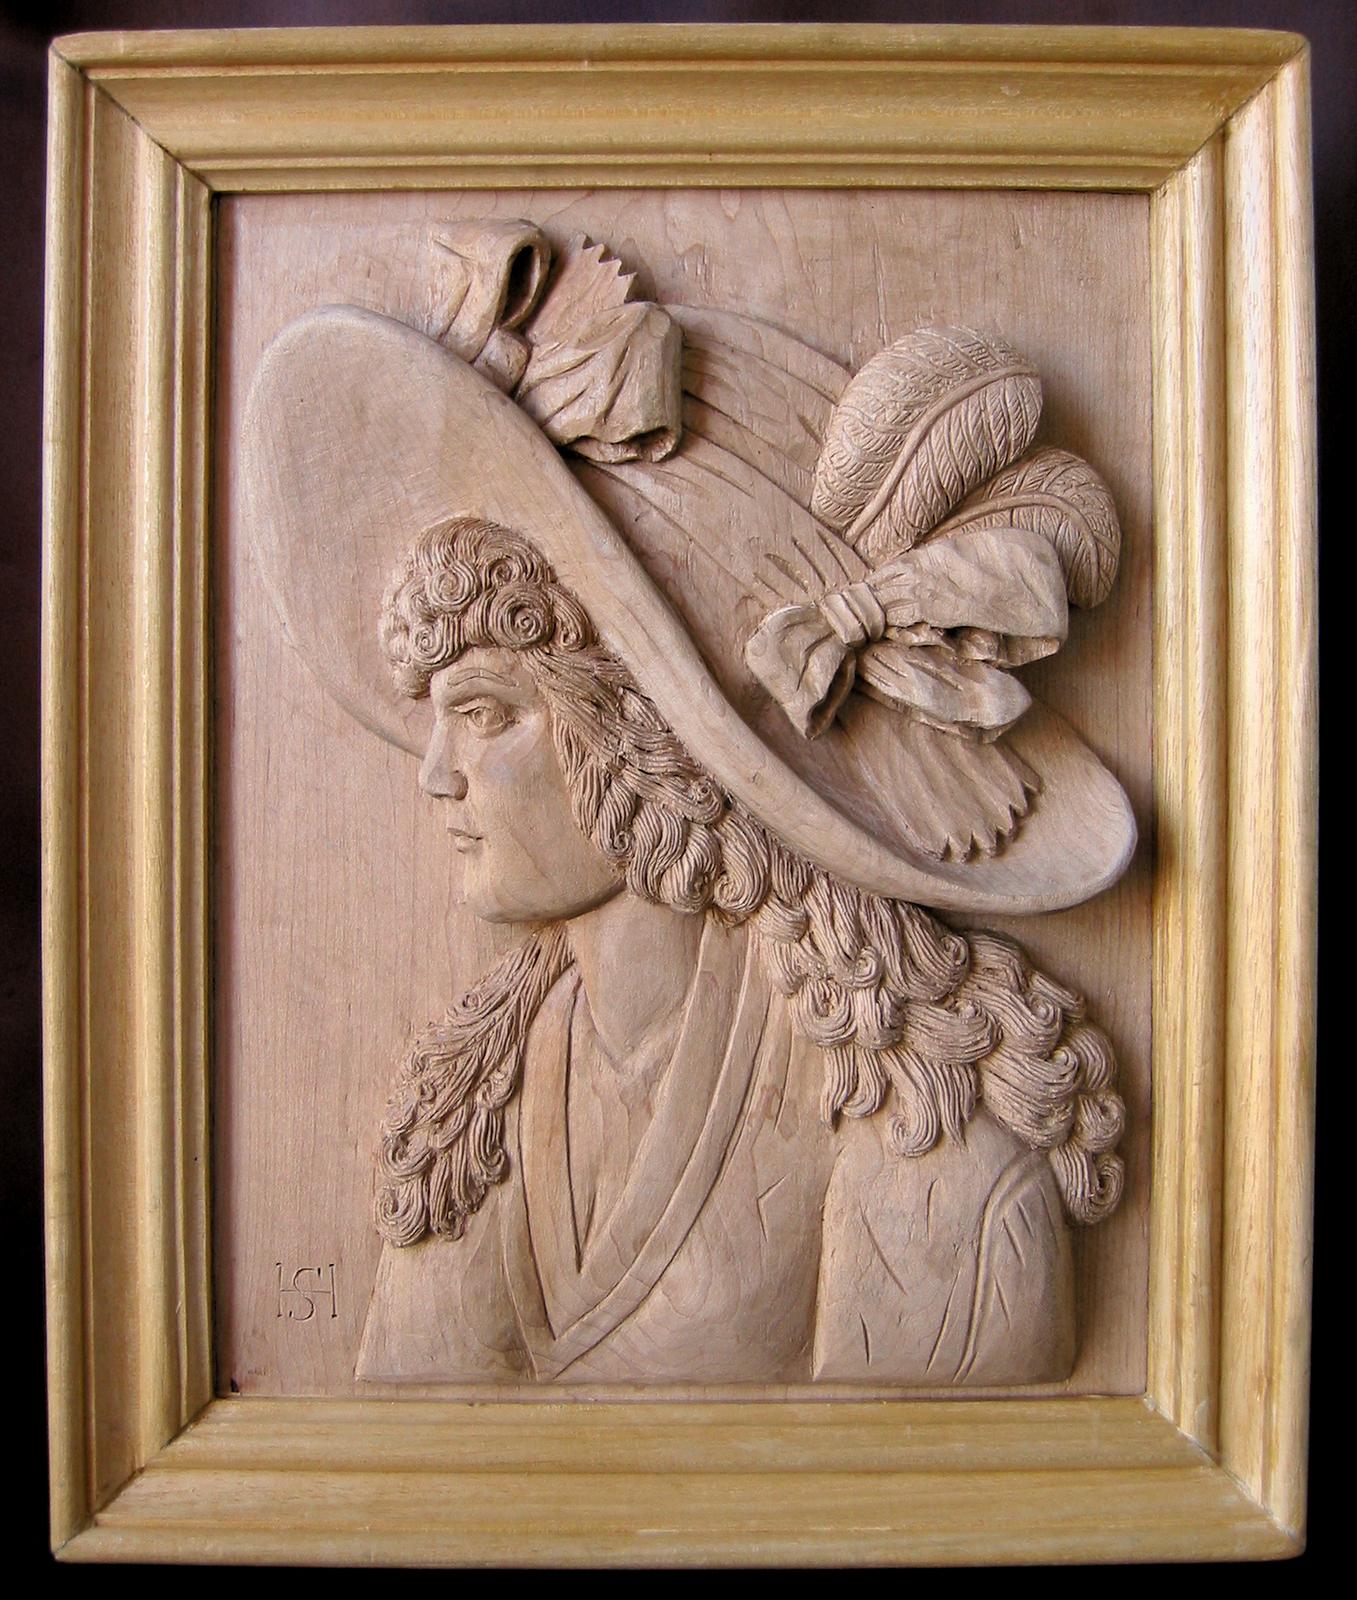 Dama con sombrero : Talla en madera. Wood carving. Esculturas